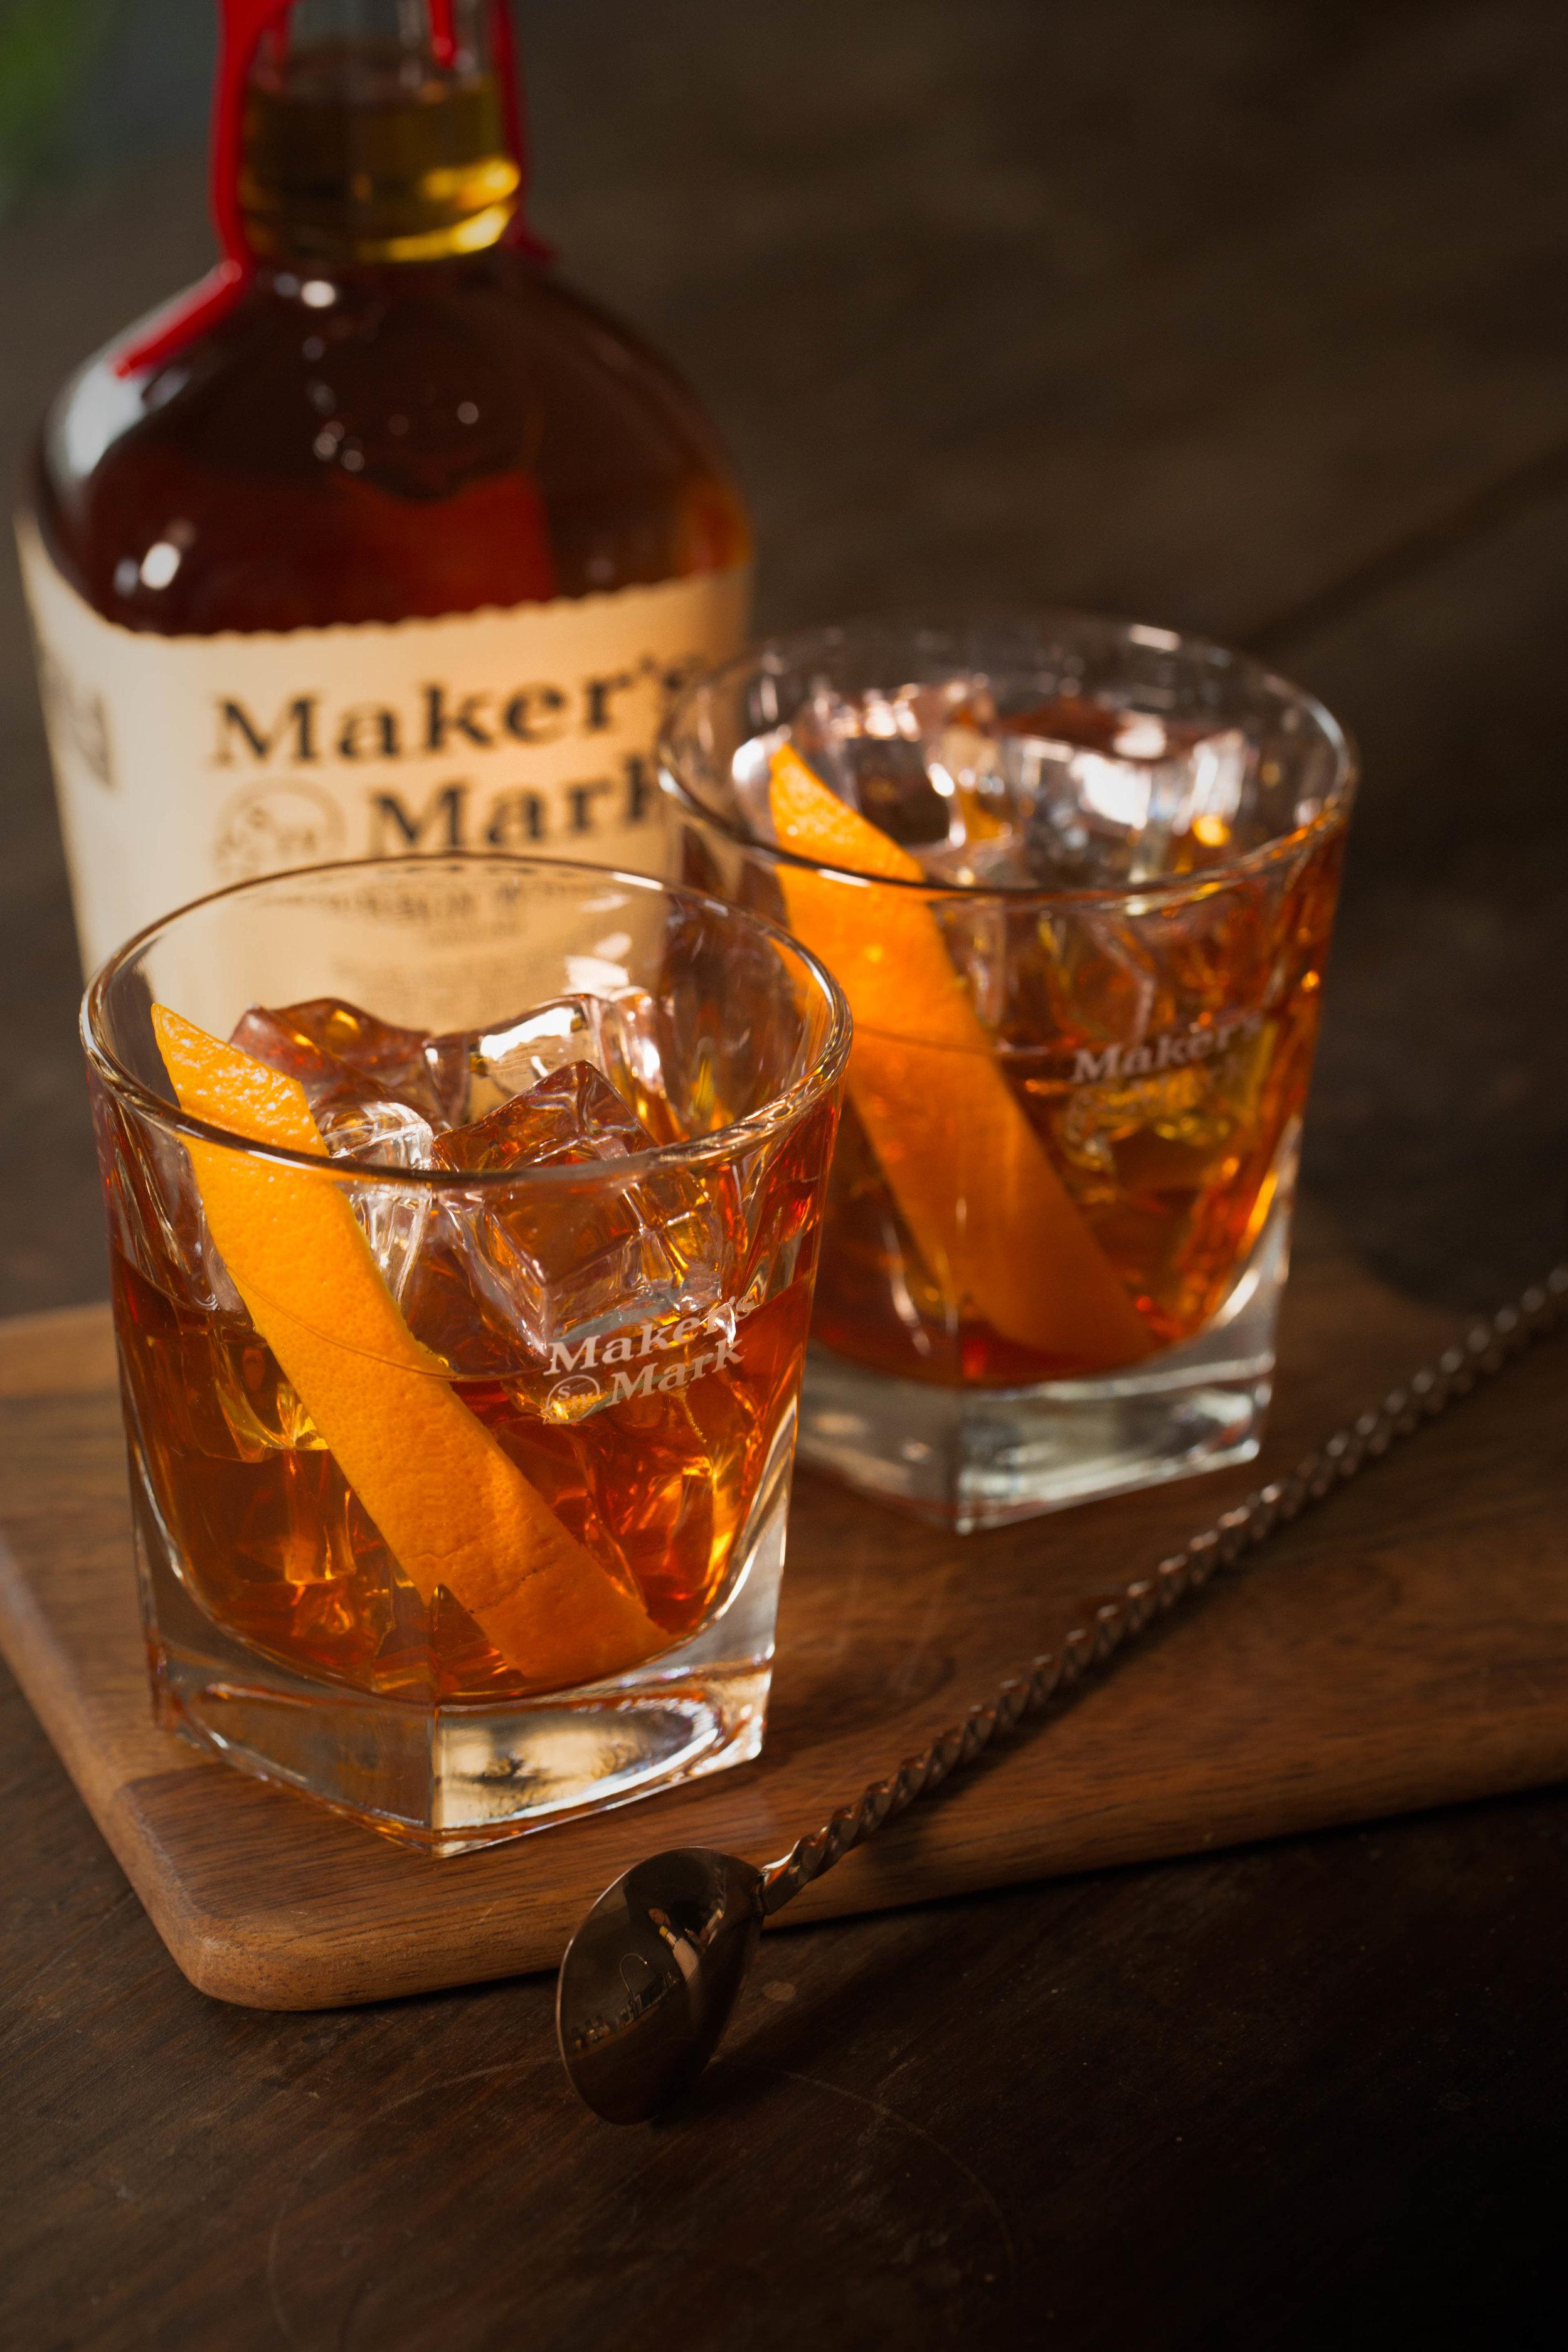 commercial photographer, commercial photography, whisky whiskey photography glasgow edinburgh scotland